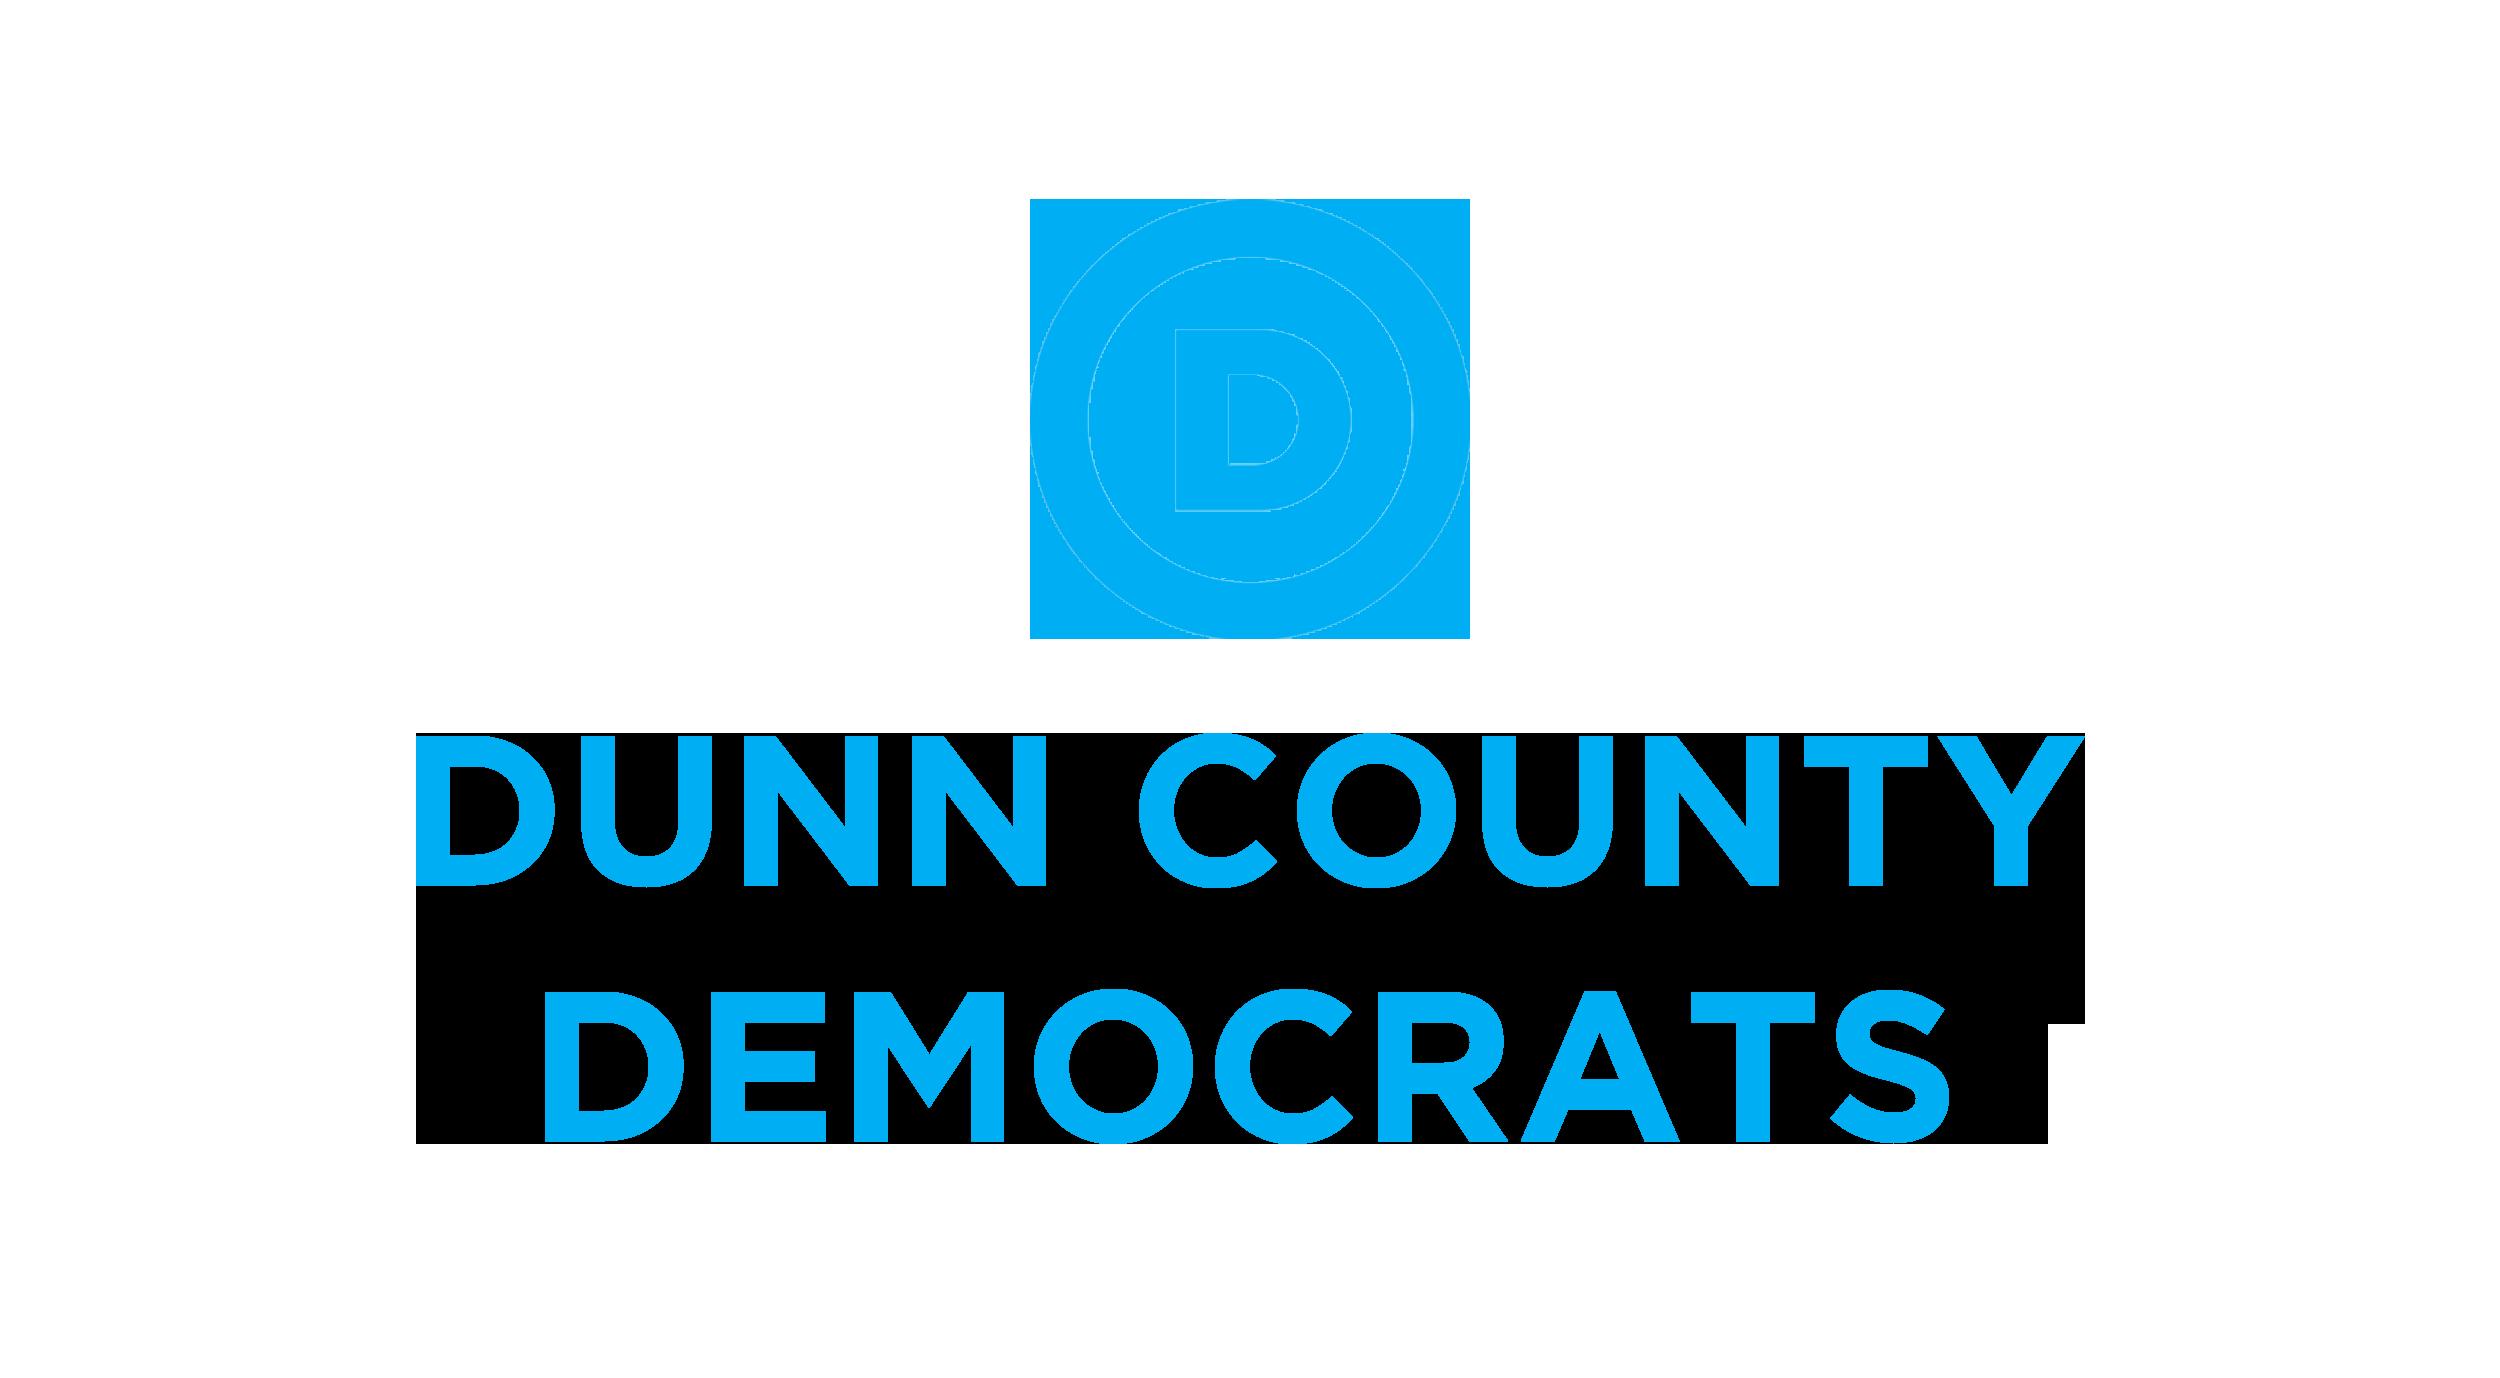 Dunn County Democrats (WI)